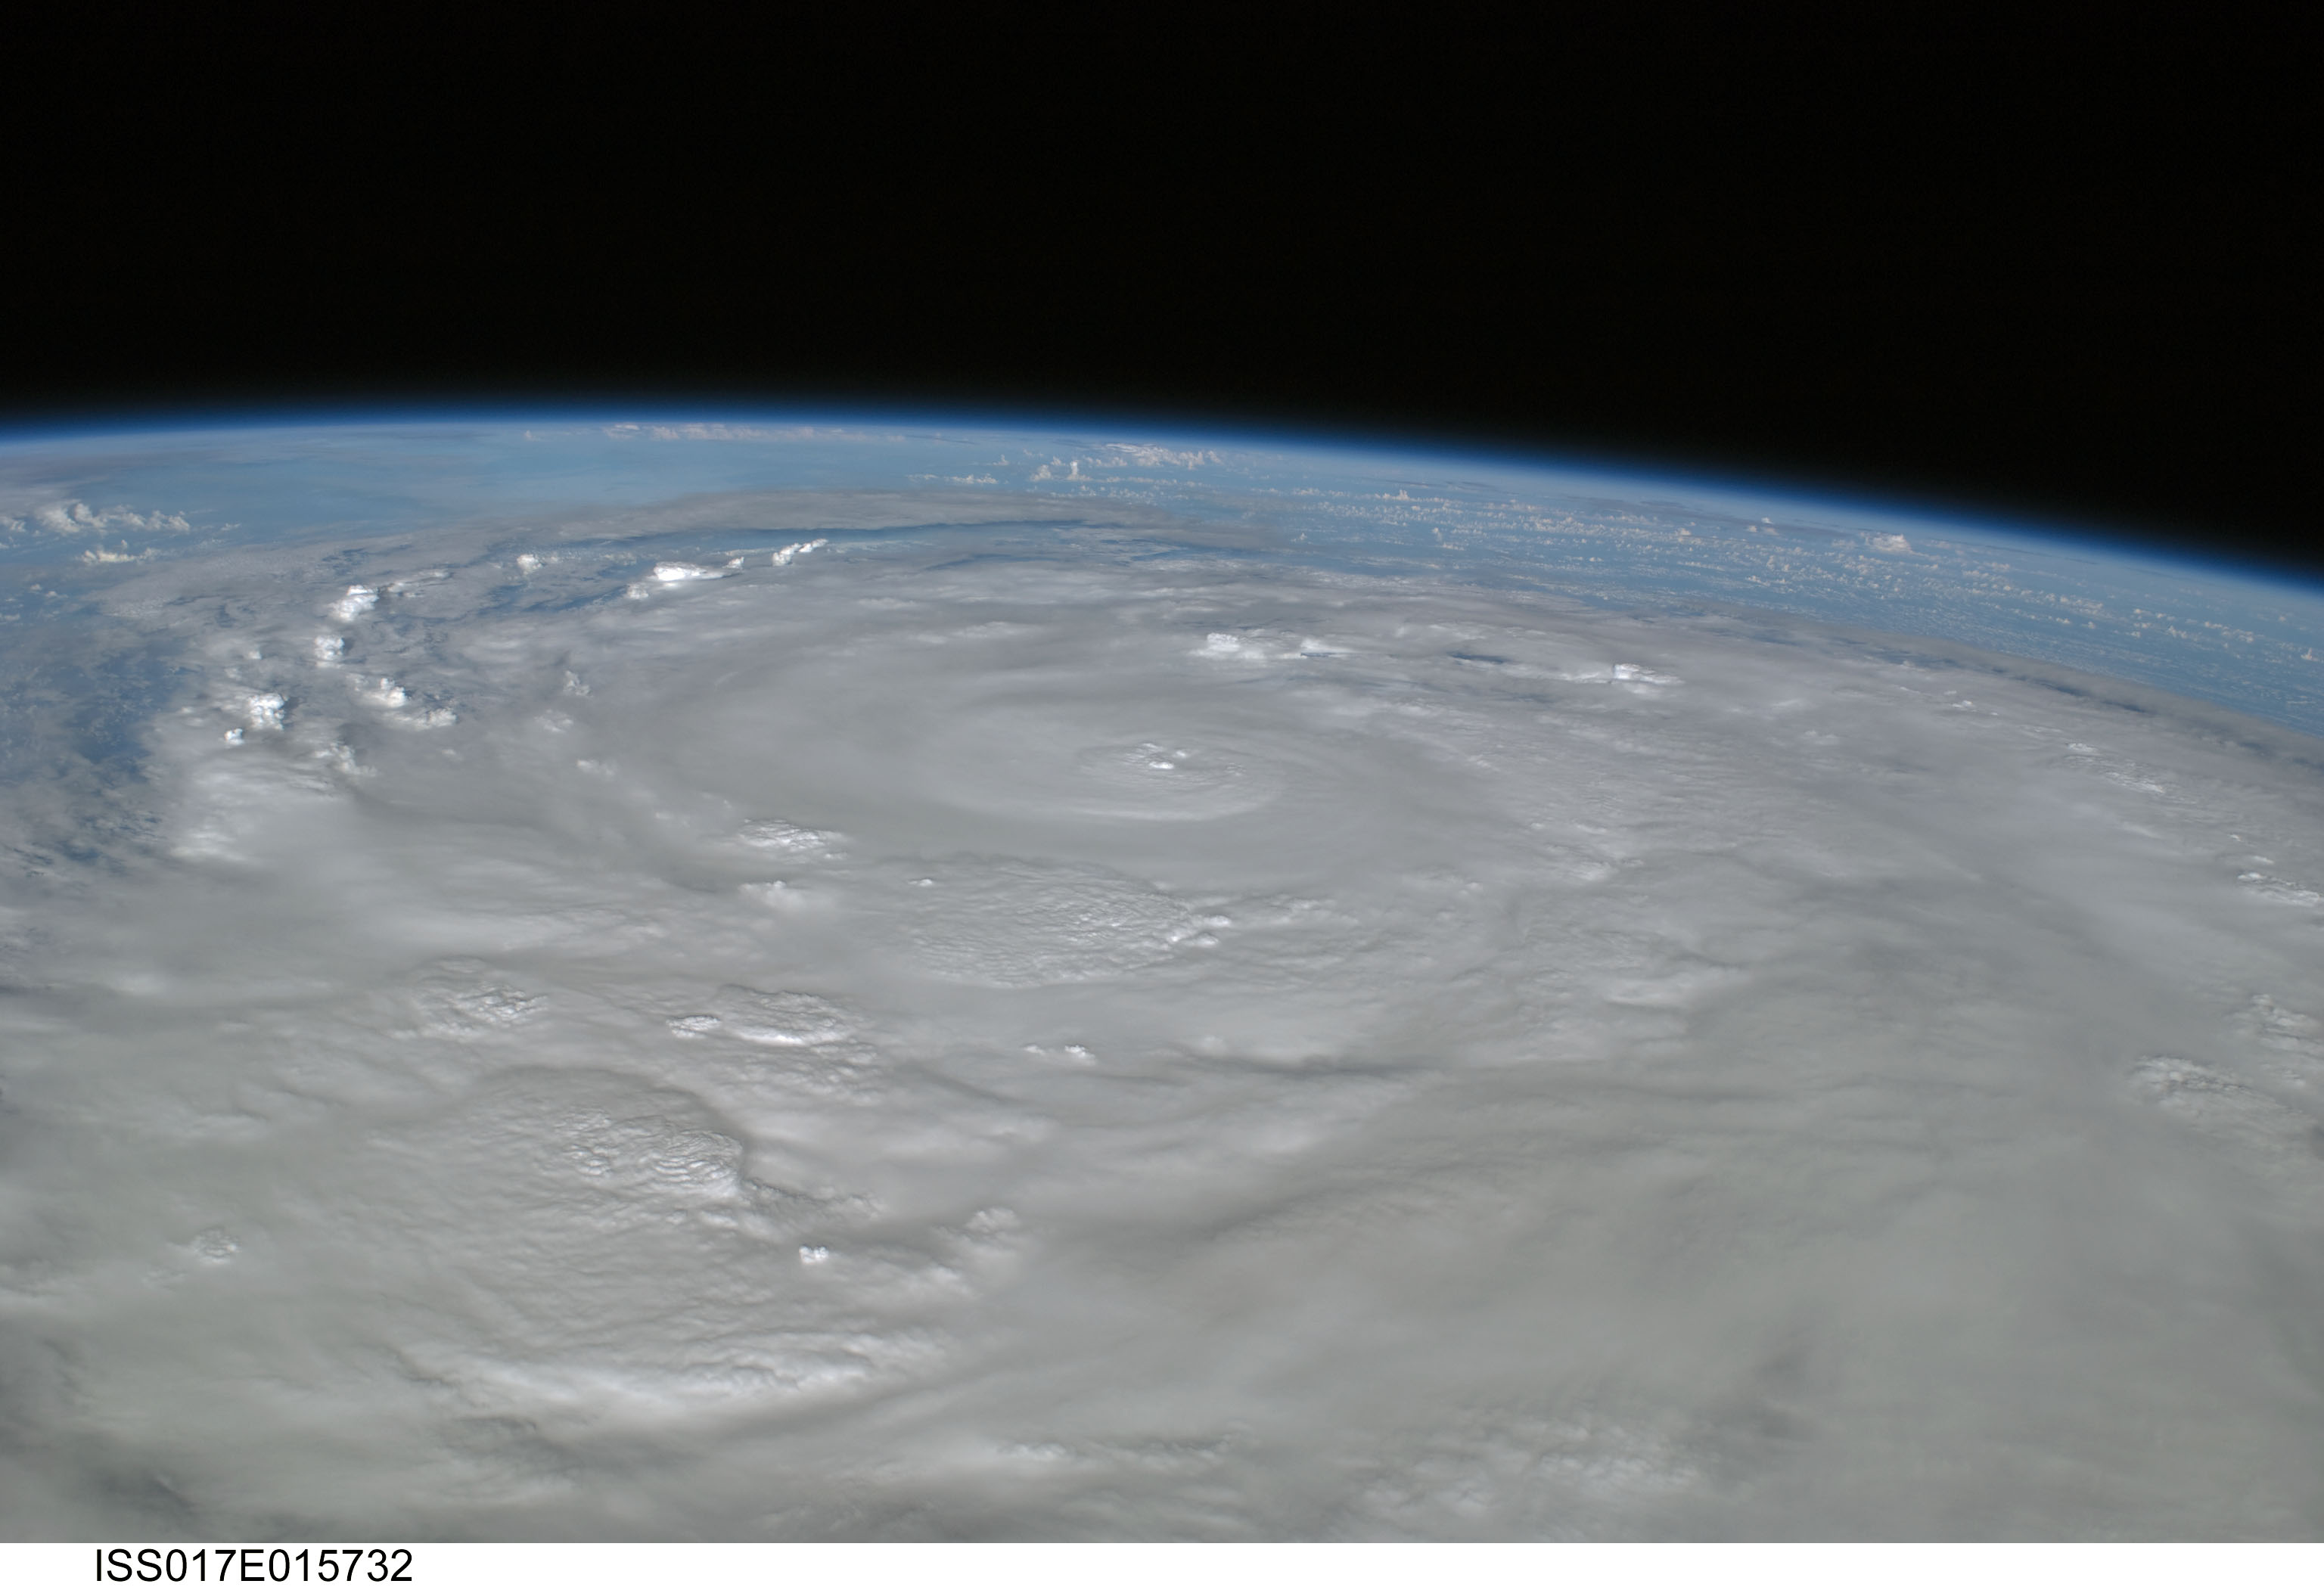 Huracanes. Imágenes satelitales Nasa alucinantes.